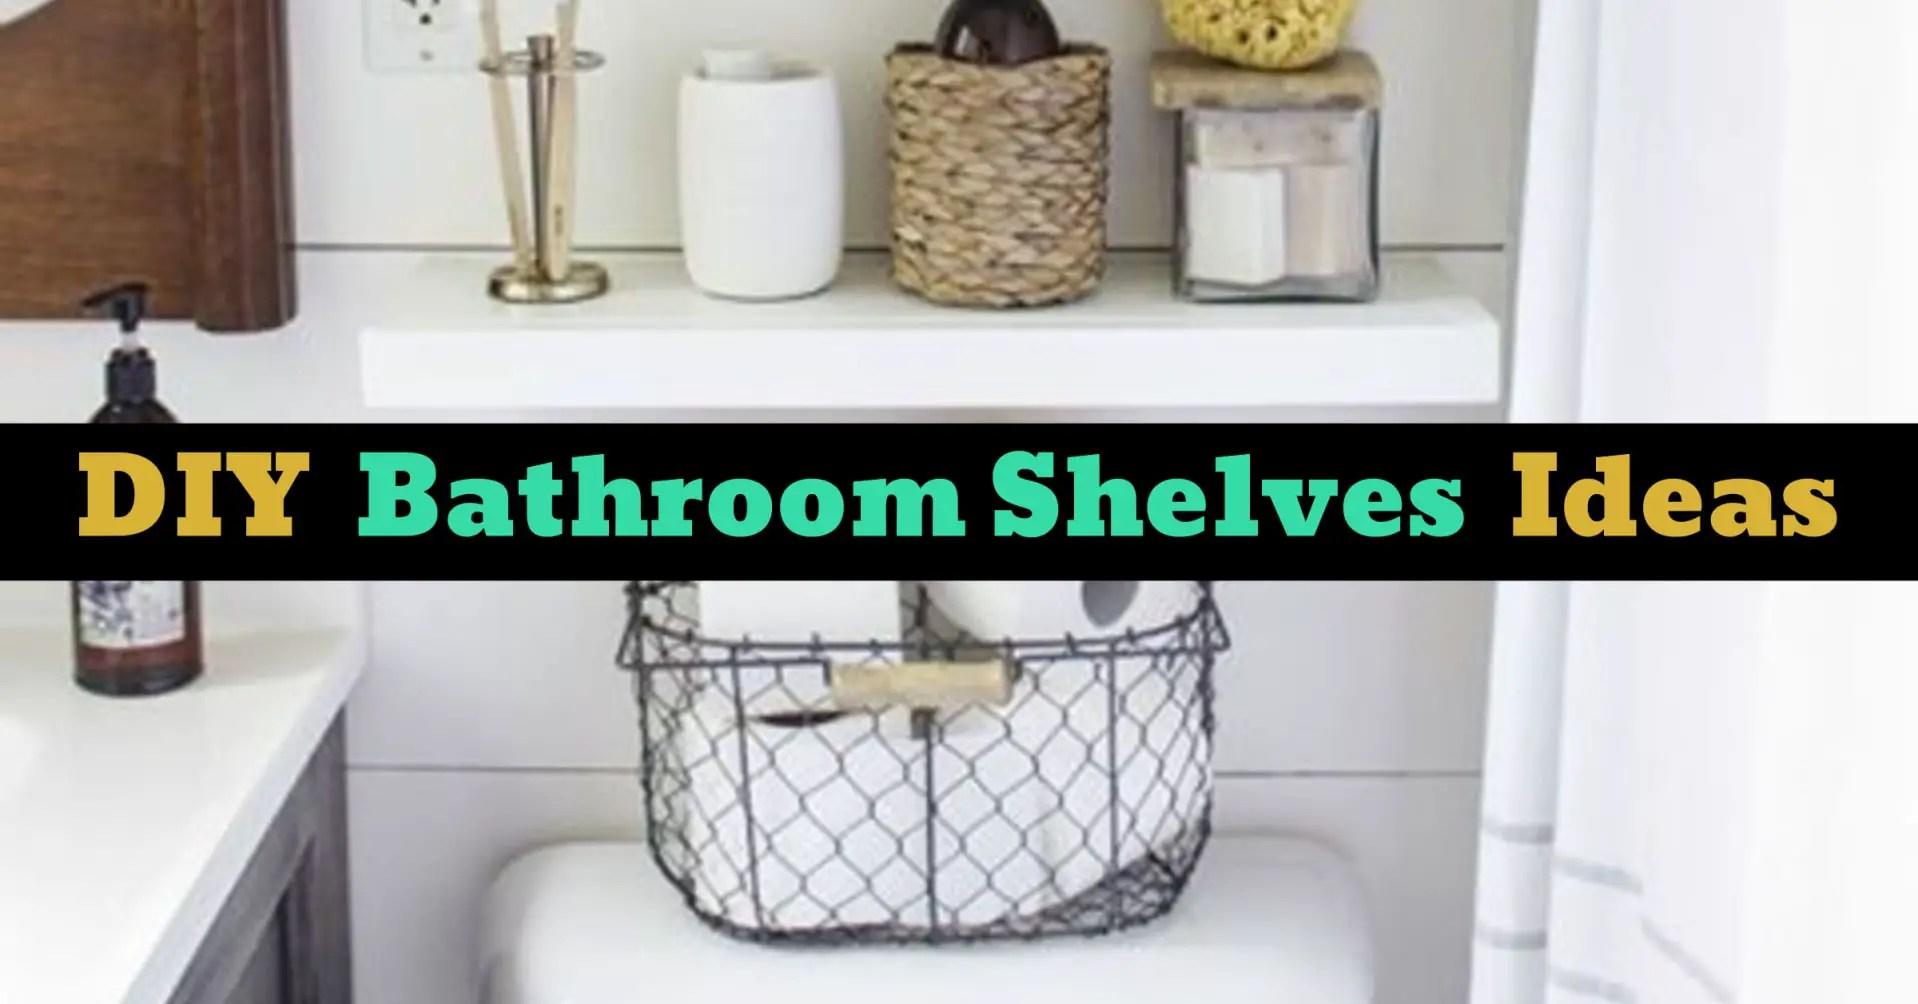 Bathroom Shelves Beautiful And Easy Diy Bathroom Space Saver Shelving Ideas